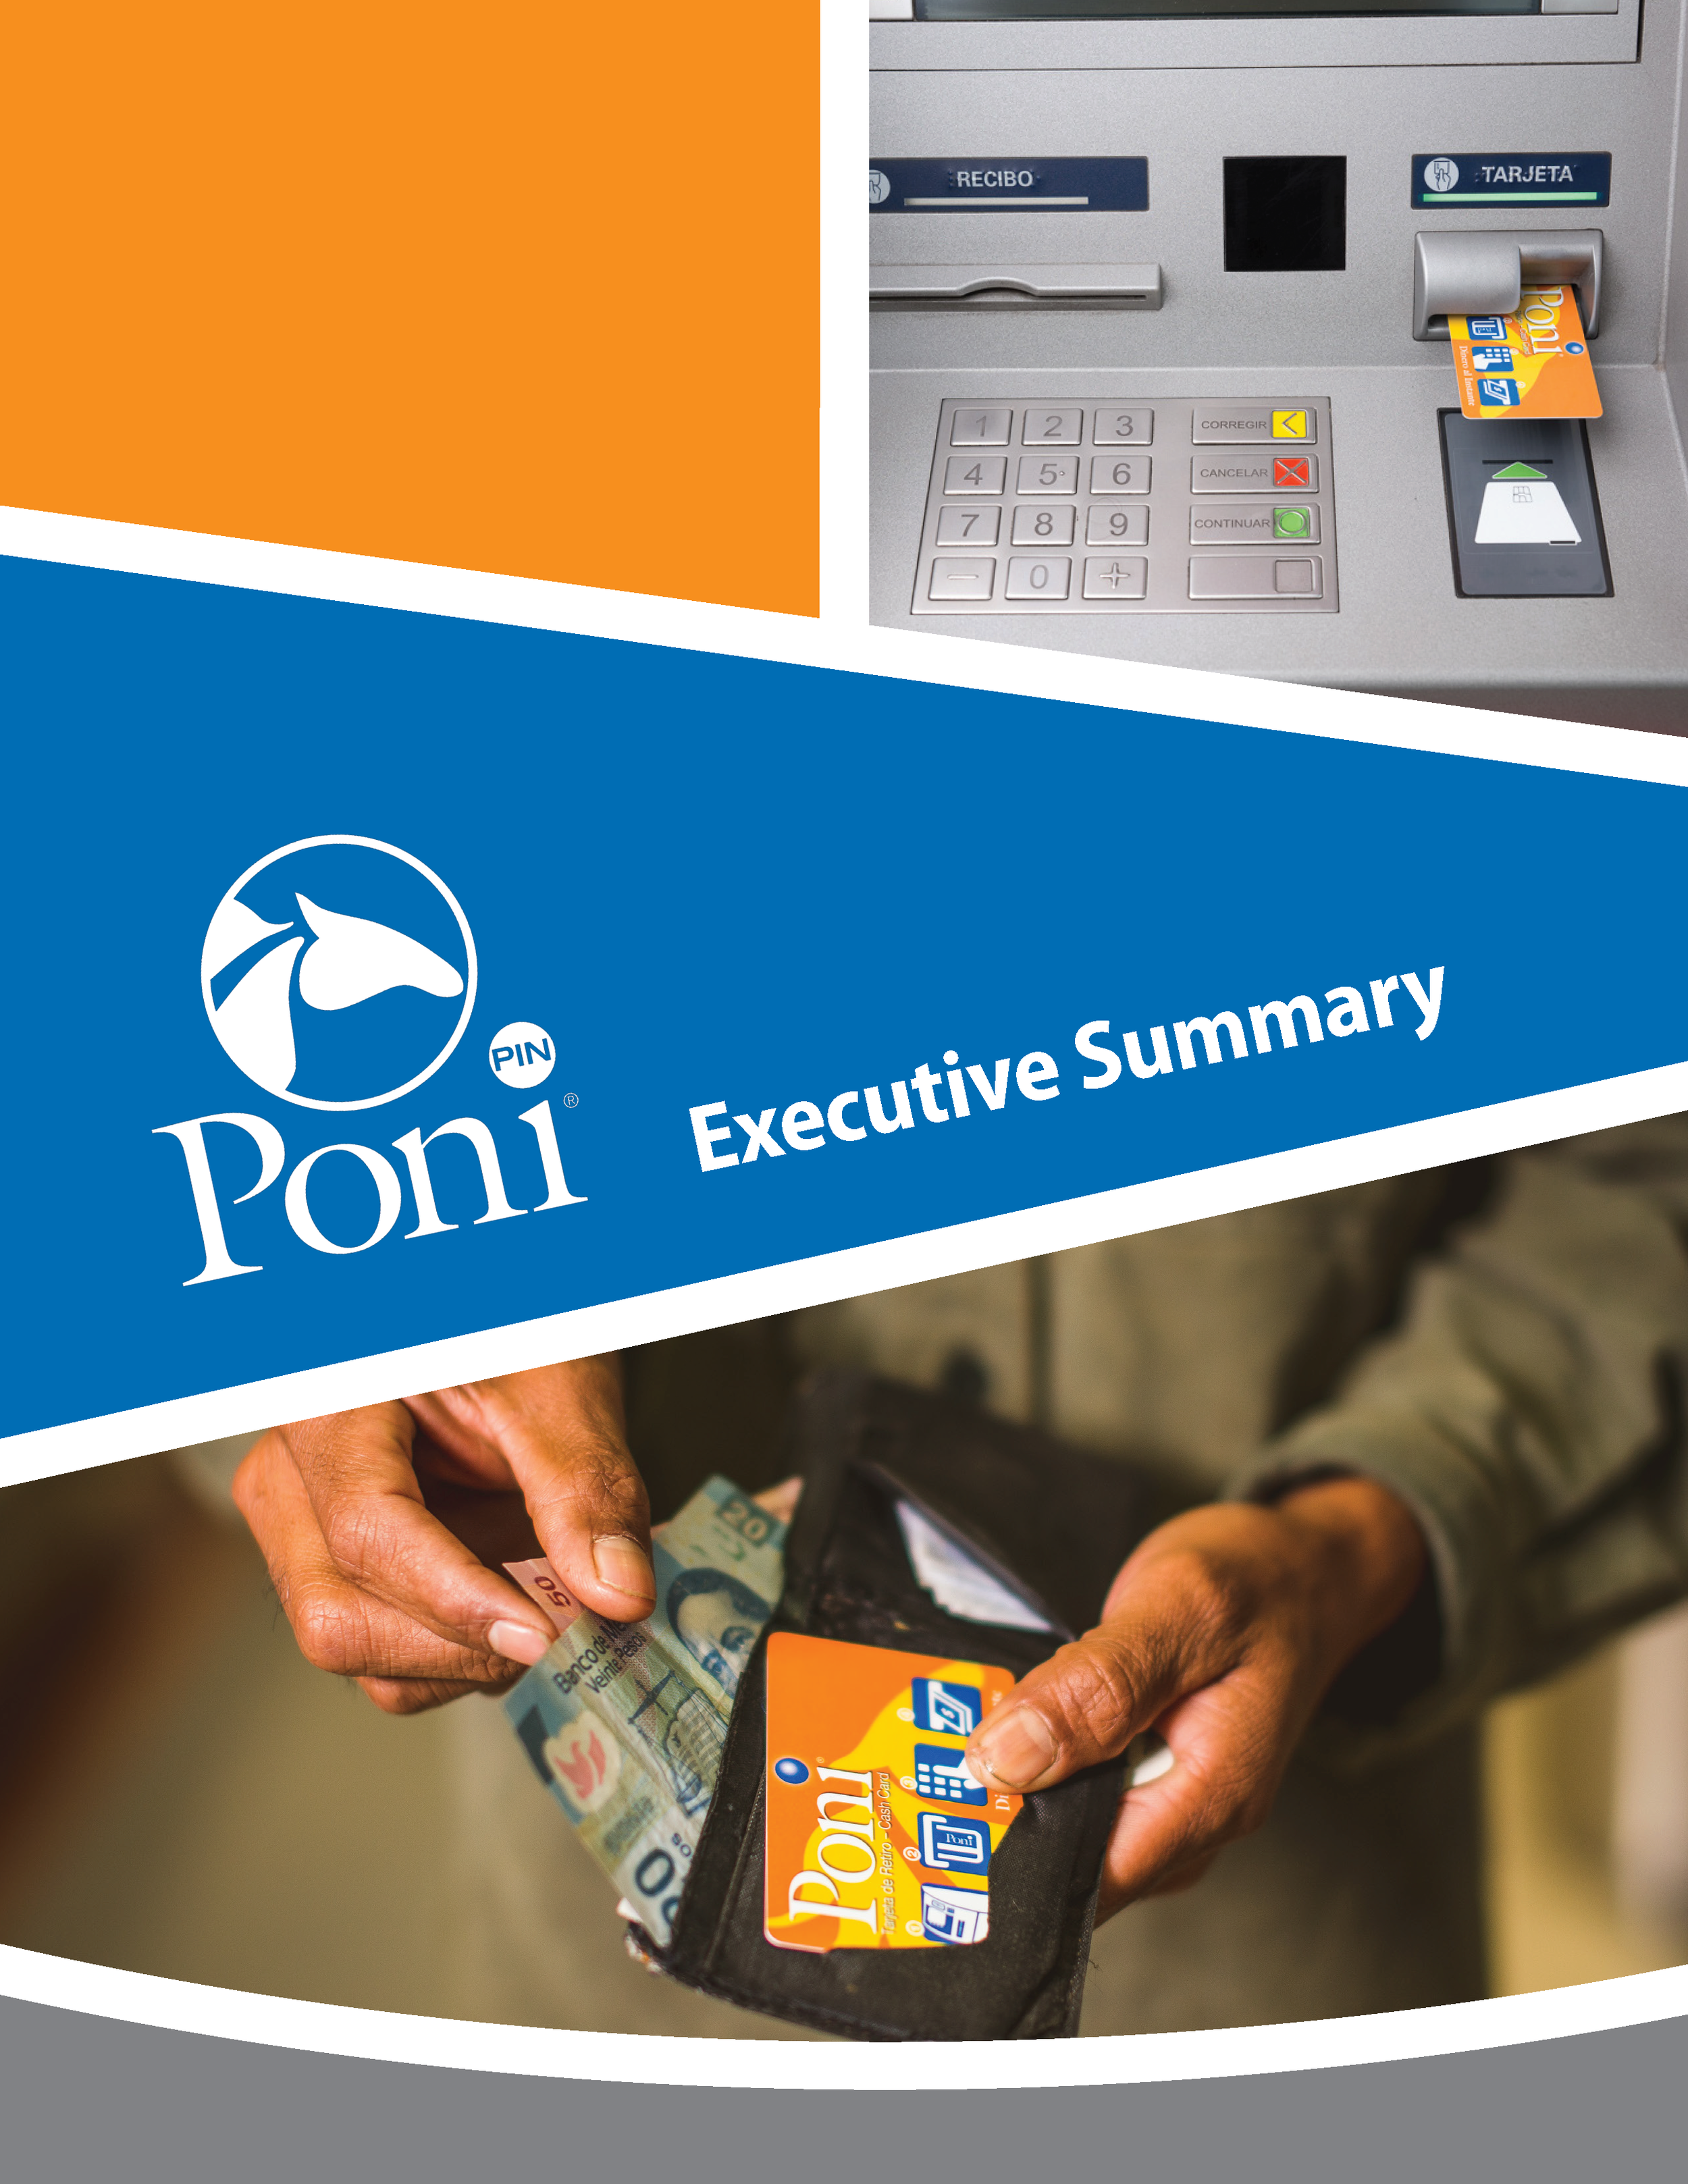 Executive Summary development [cover shown].